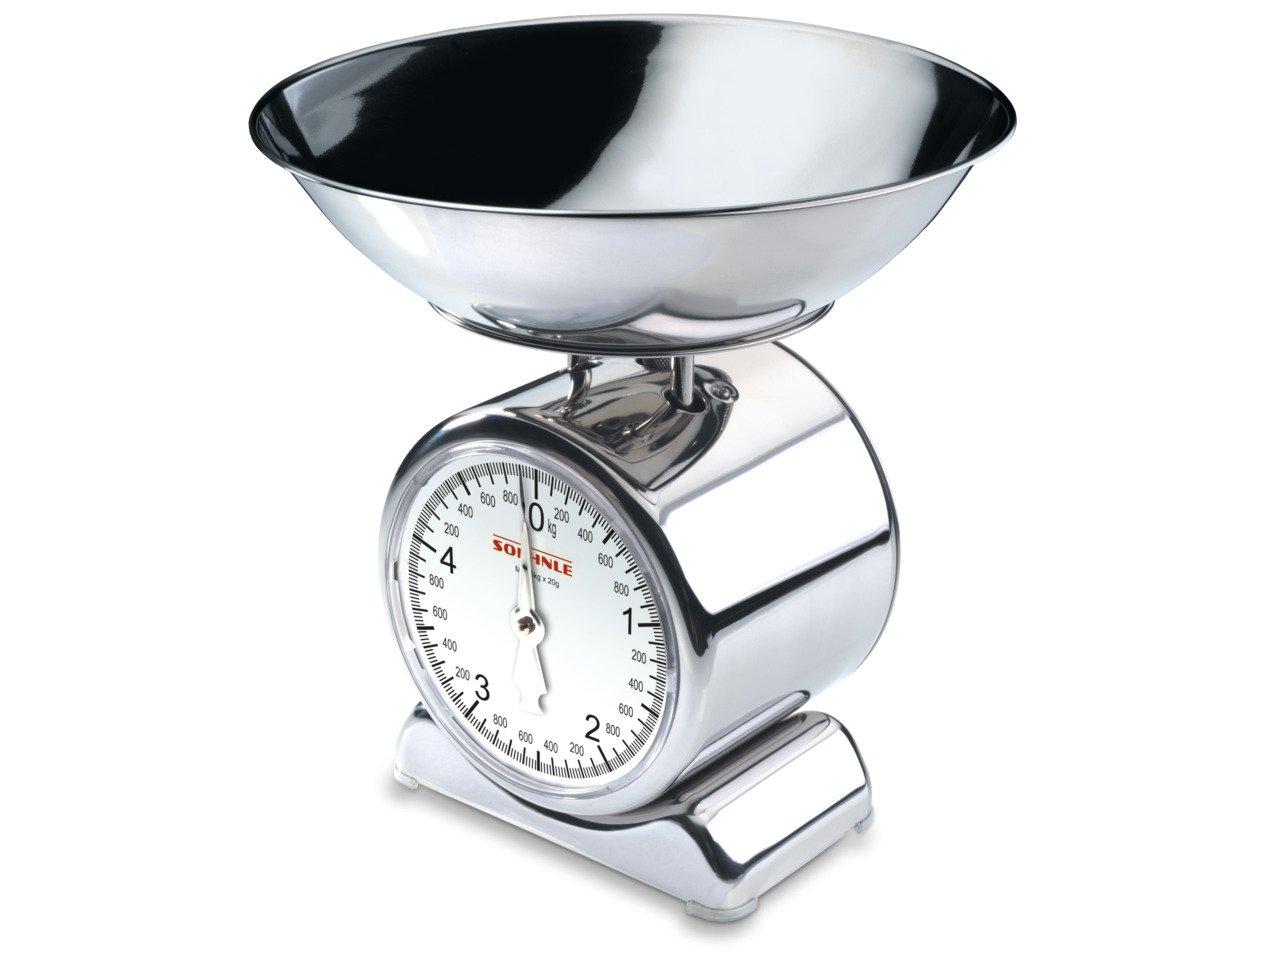 Soehnle Silvia Bilancia da Cucina, in Acciaio Inox, Argento 65003 alimenti analogica pesa